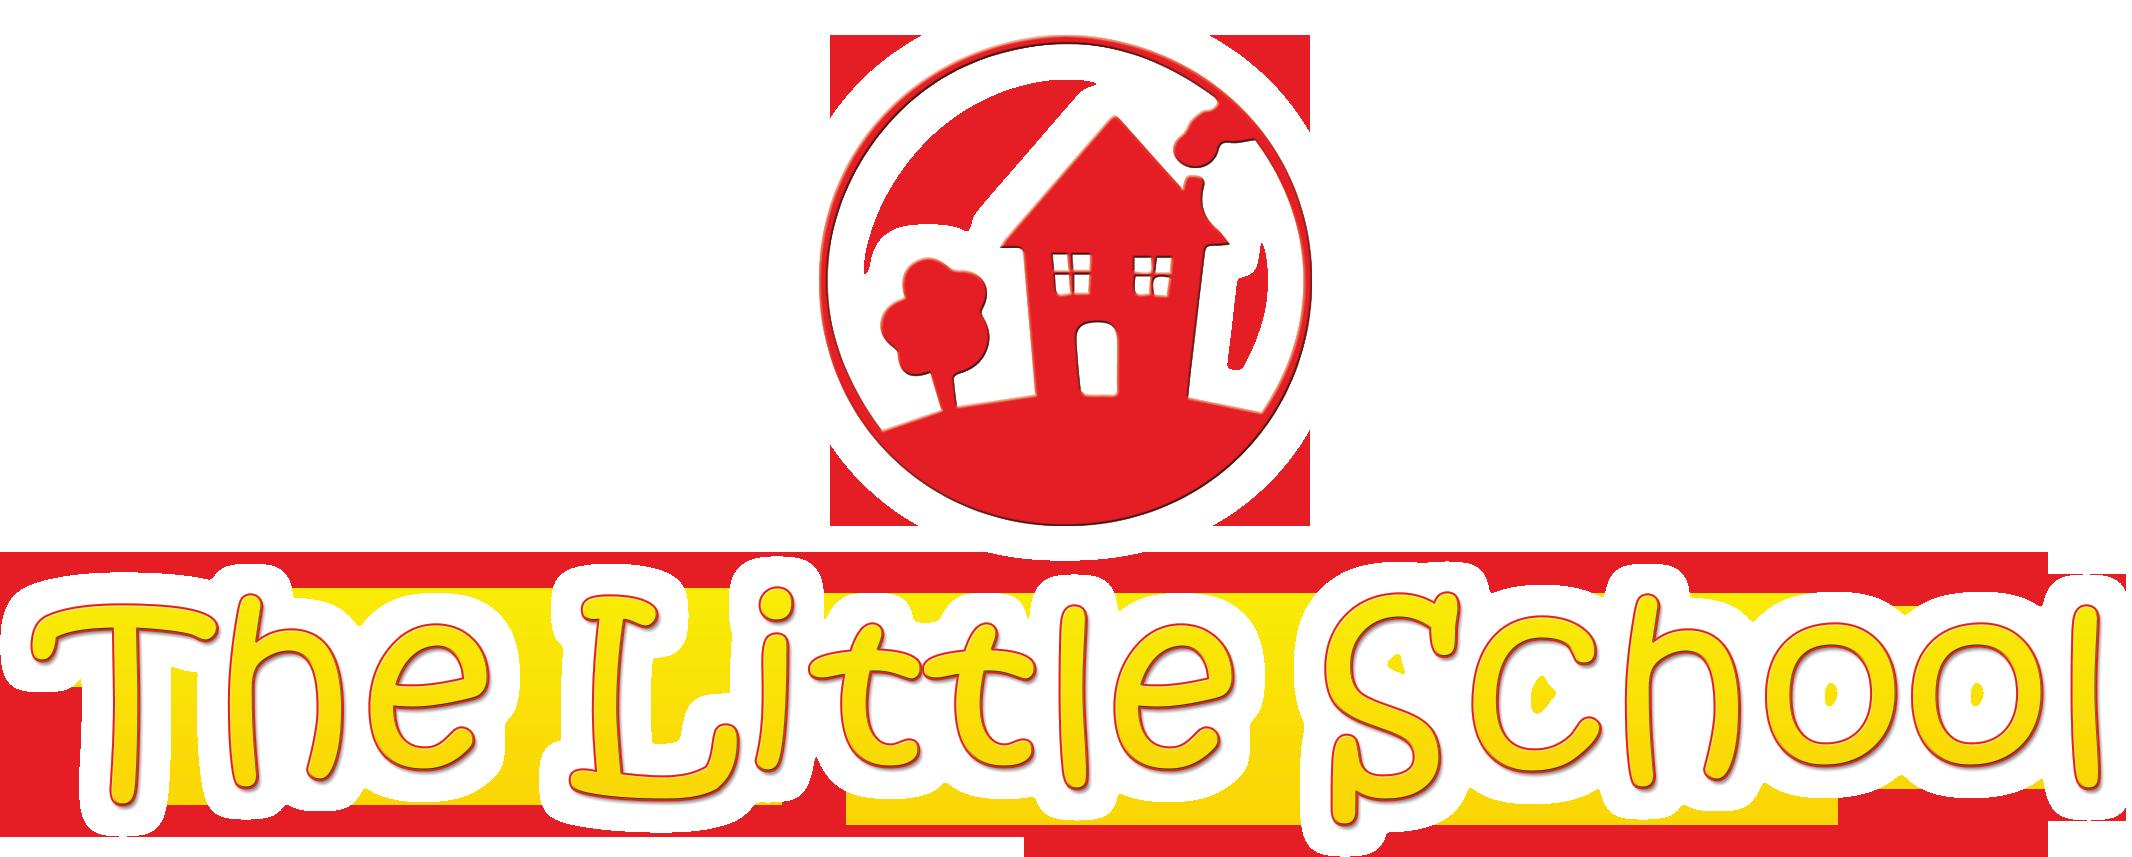 Nursery School Graphic Design Company